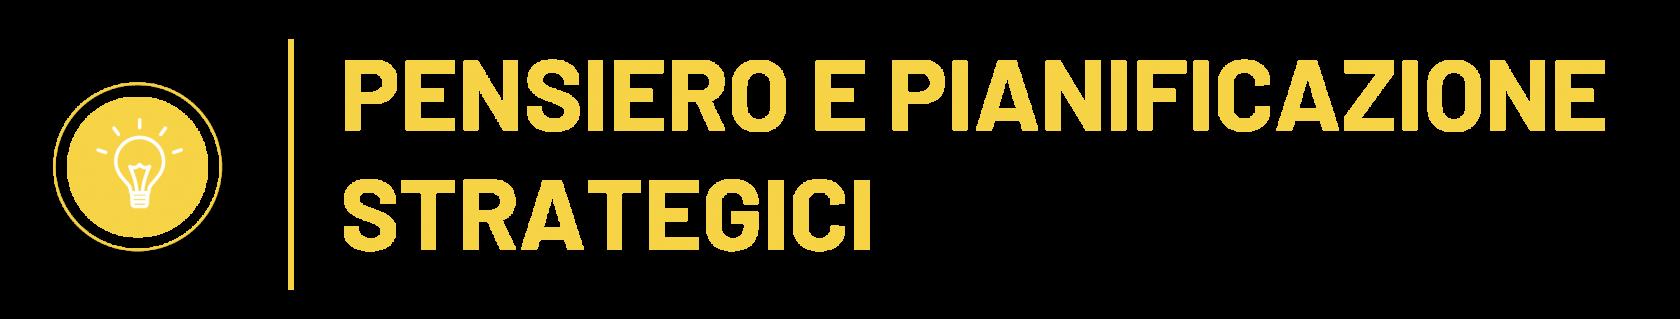 HeaderPENSIEROEPIANIFICAZIONESTRATEGICIcerchio-01